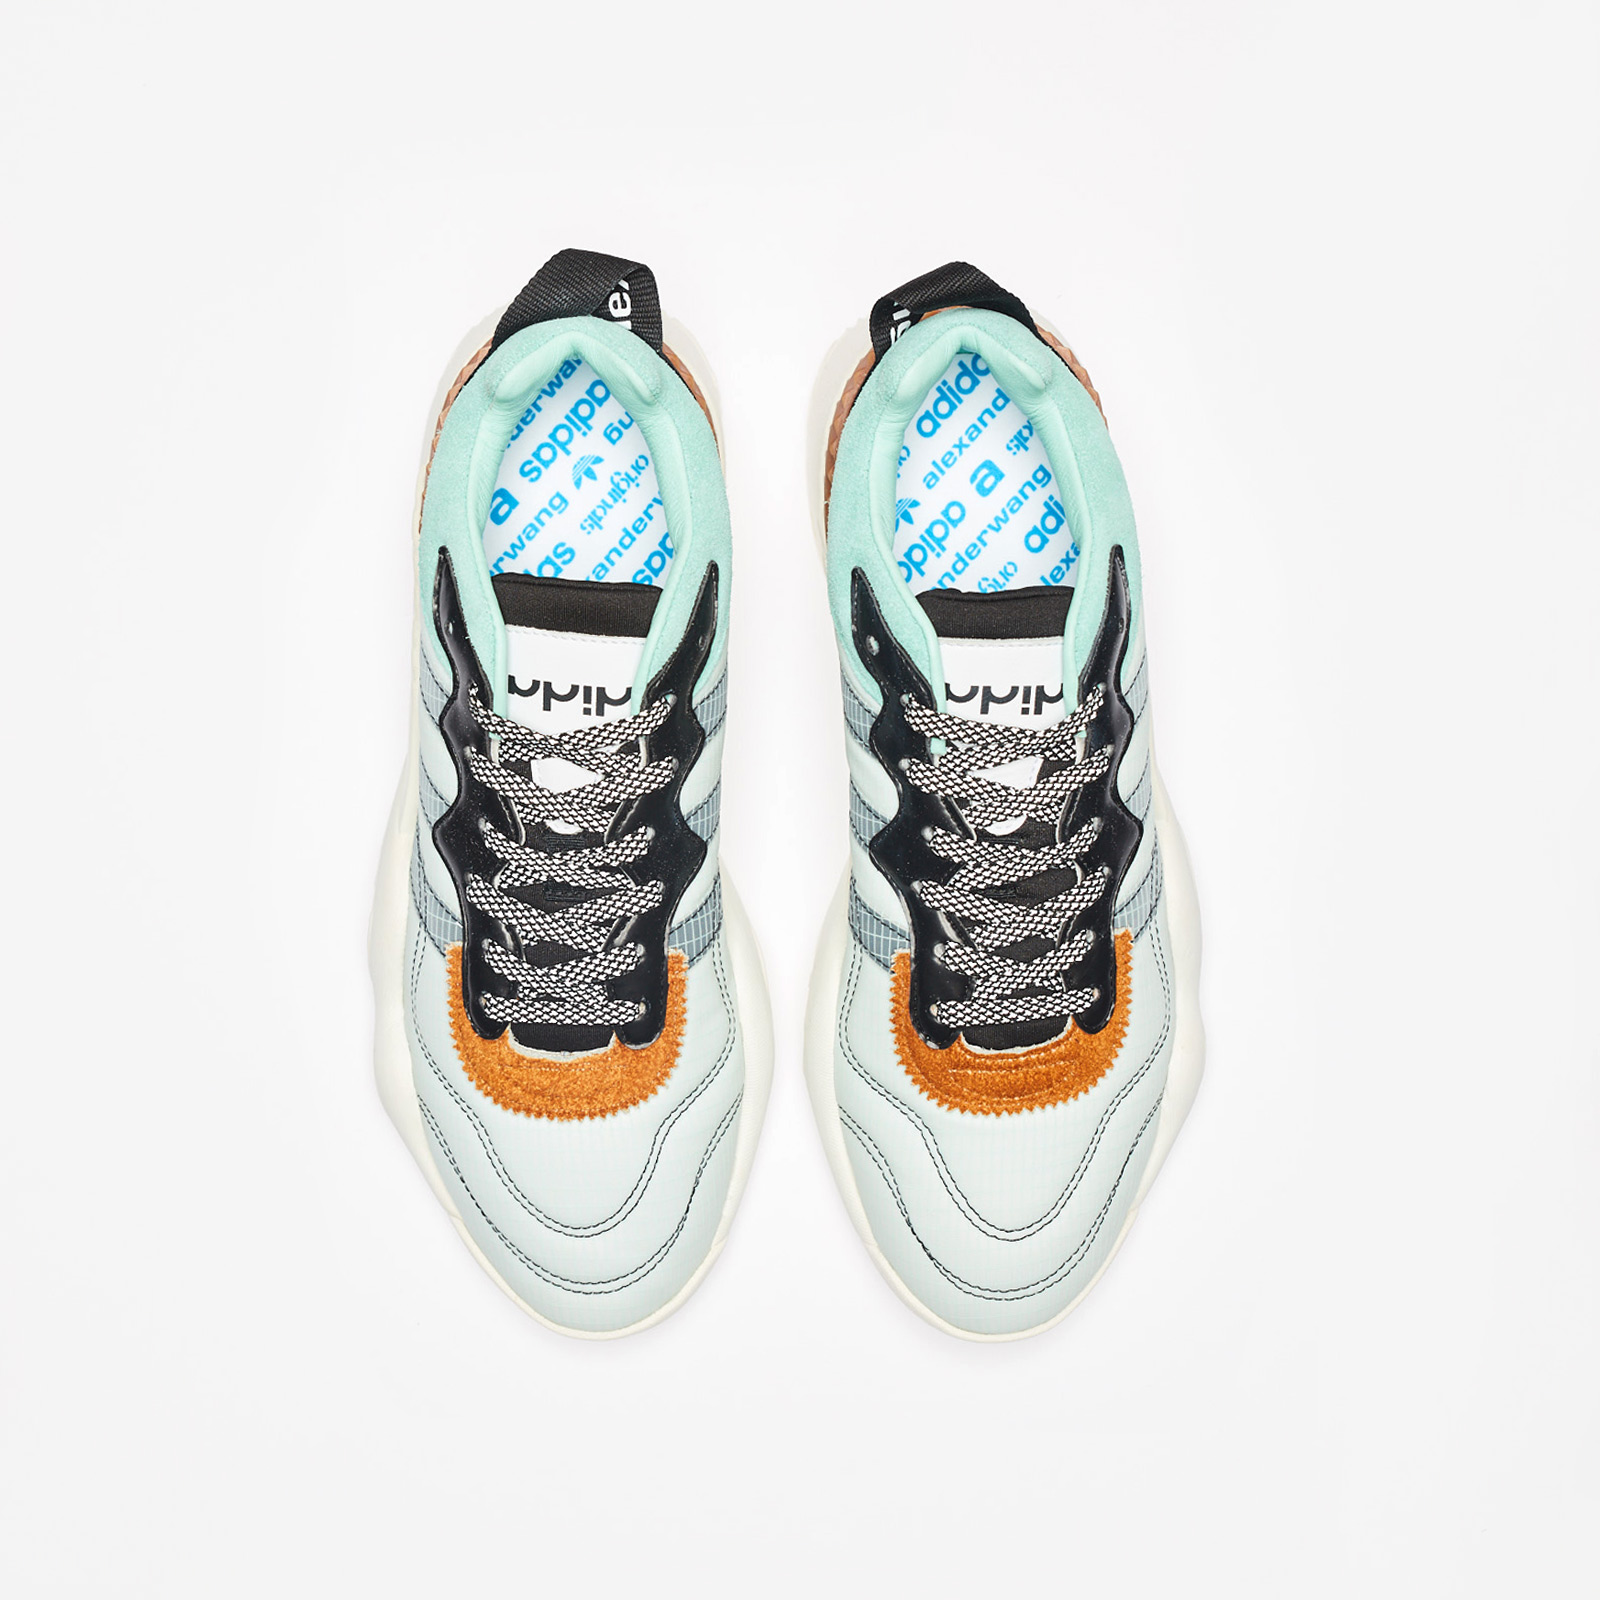 90e6168010d ... adidas Originals by Alexander Wang AW Turnout Trainer ...